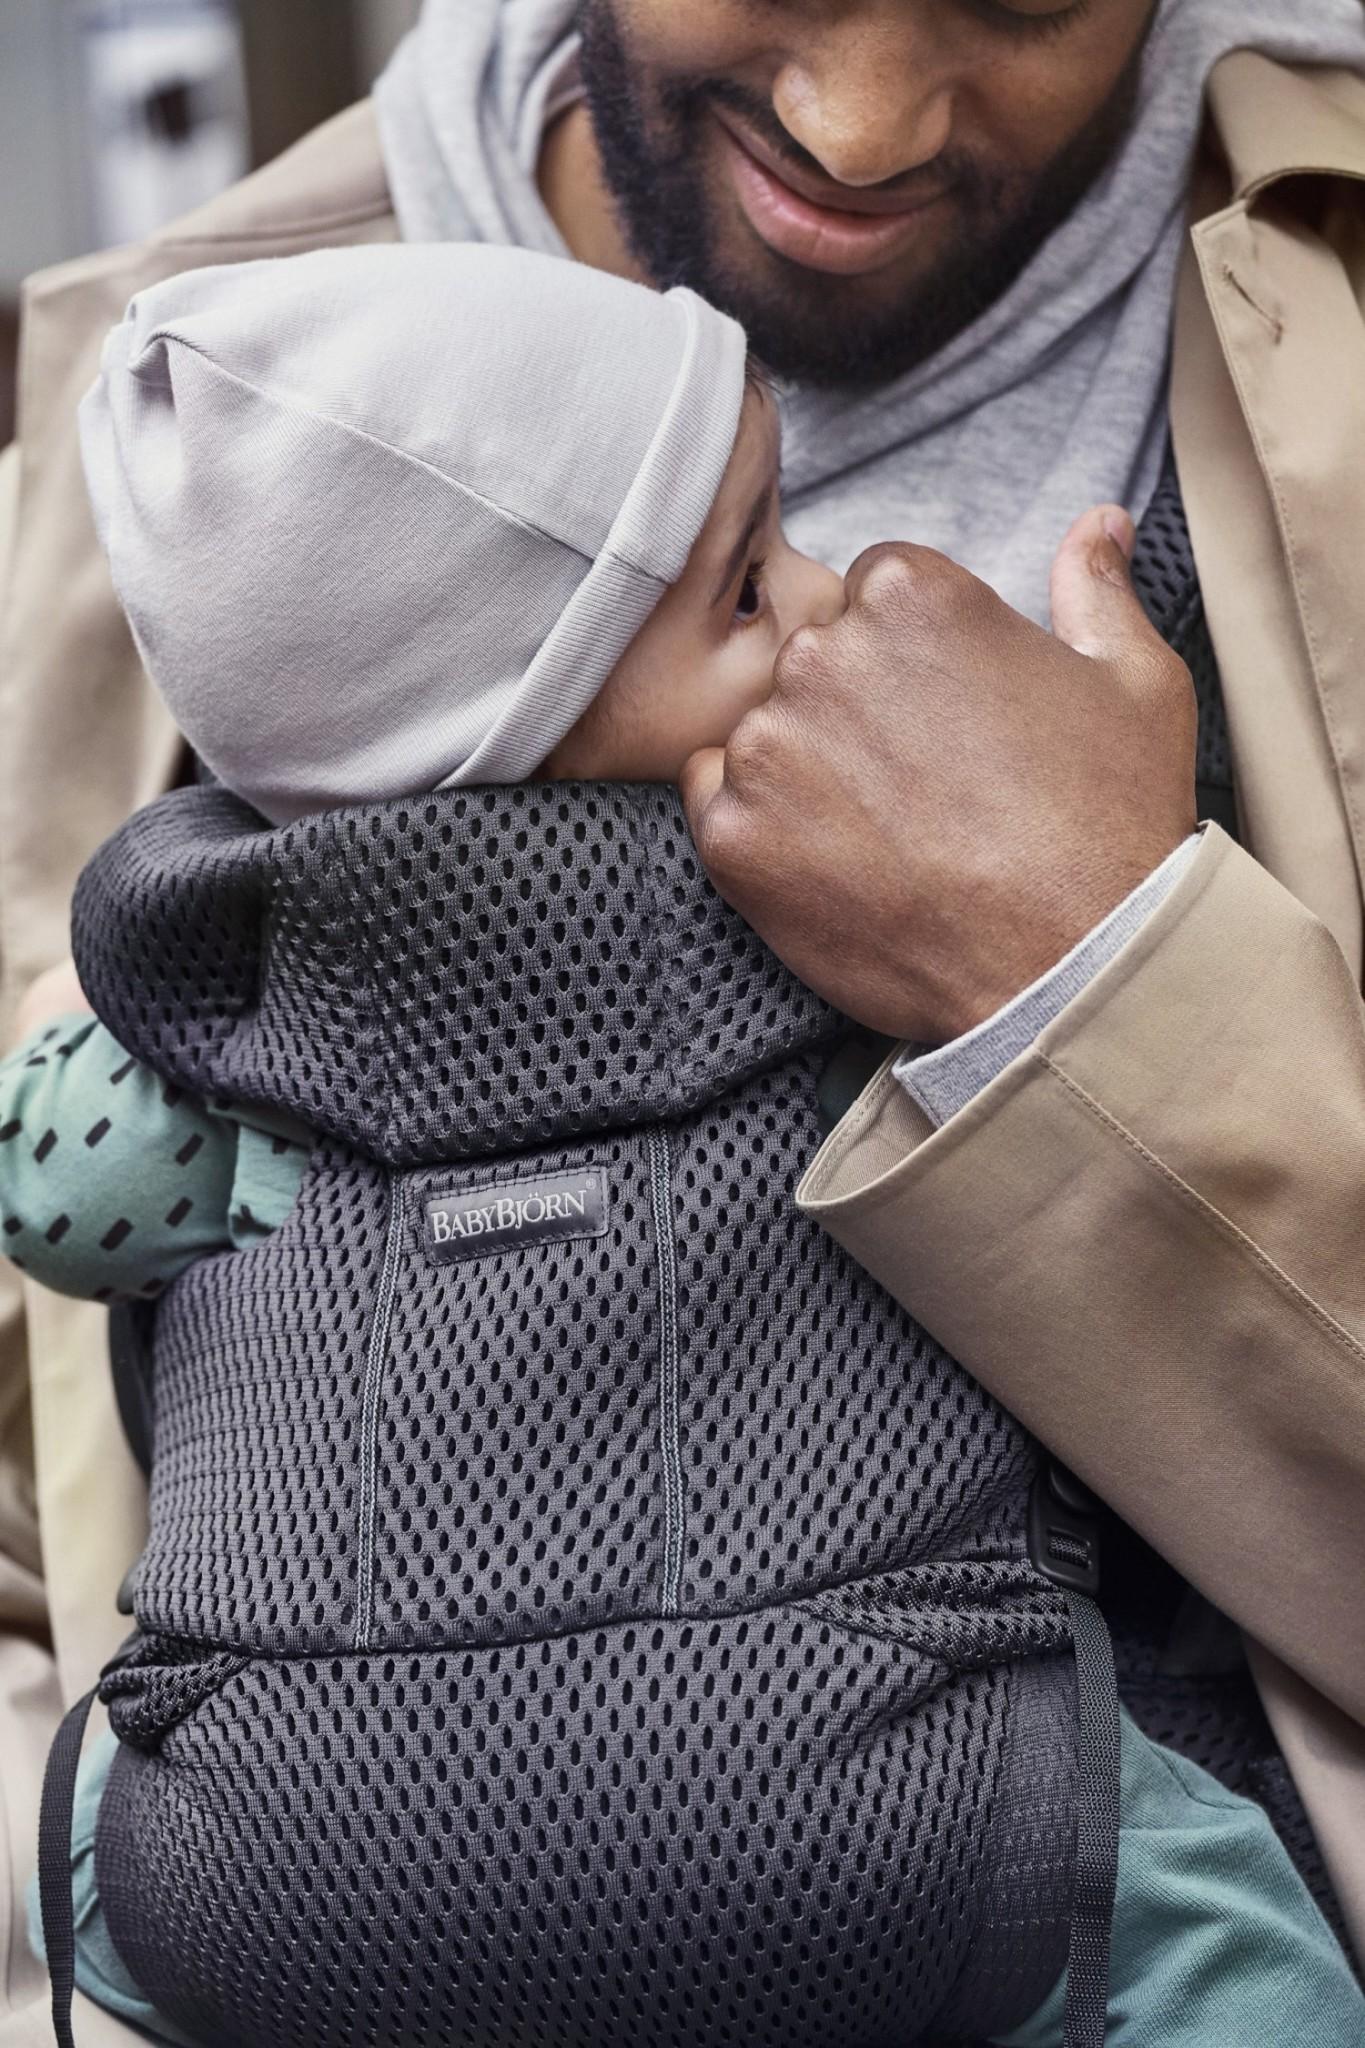 BABYBJÖRN BabyBjörn Babytrage MOVE Anthrazit 3D Mesh